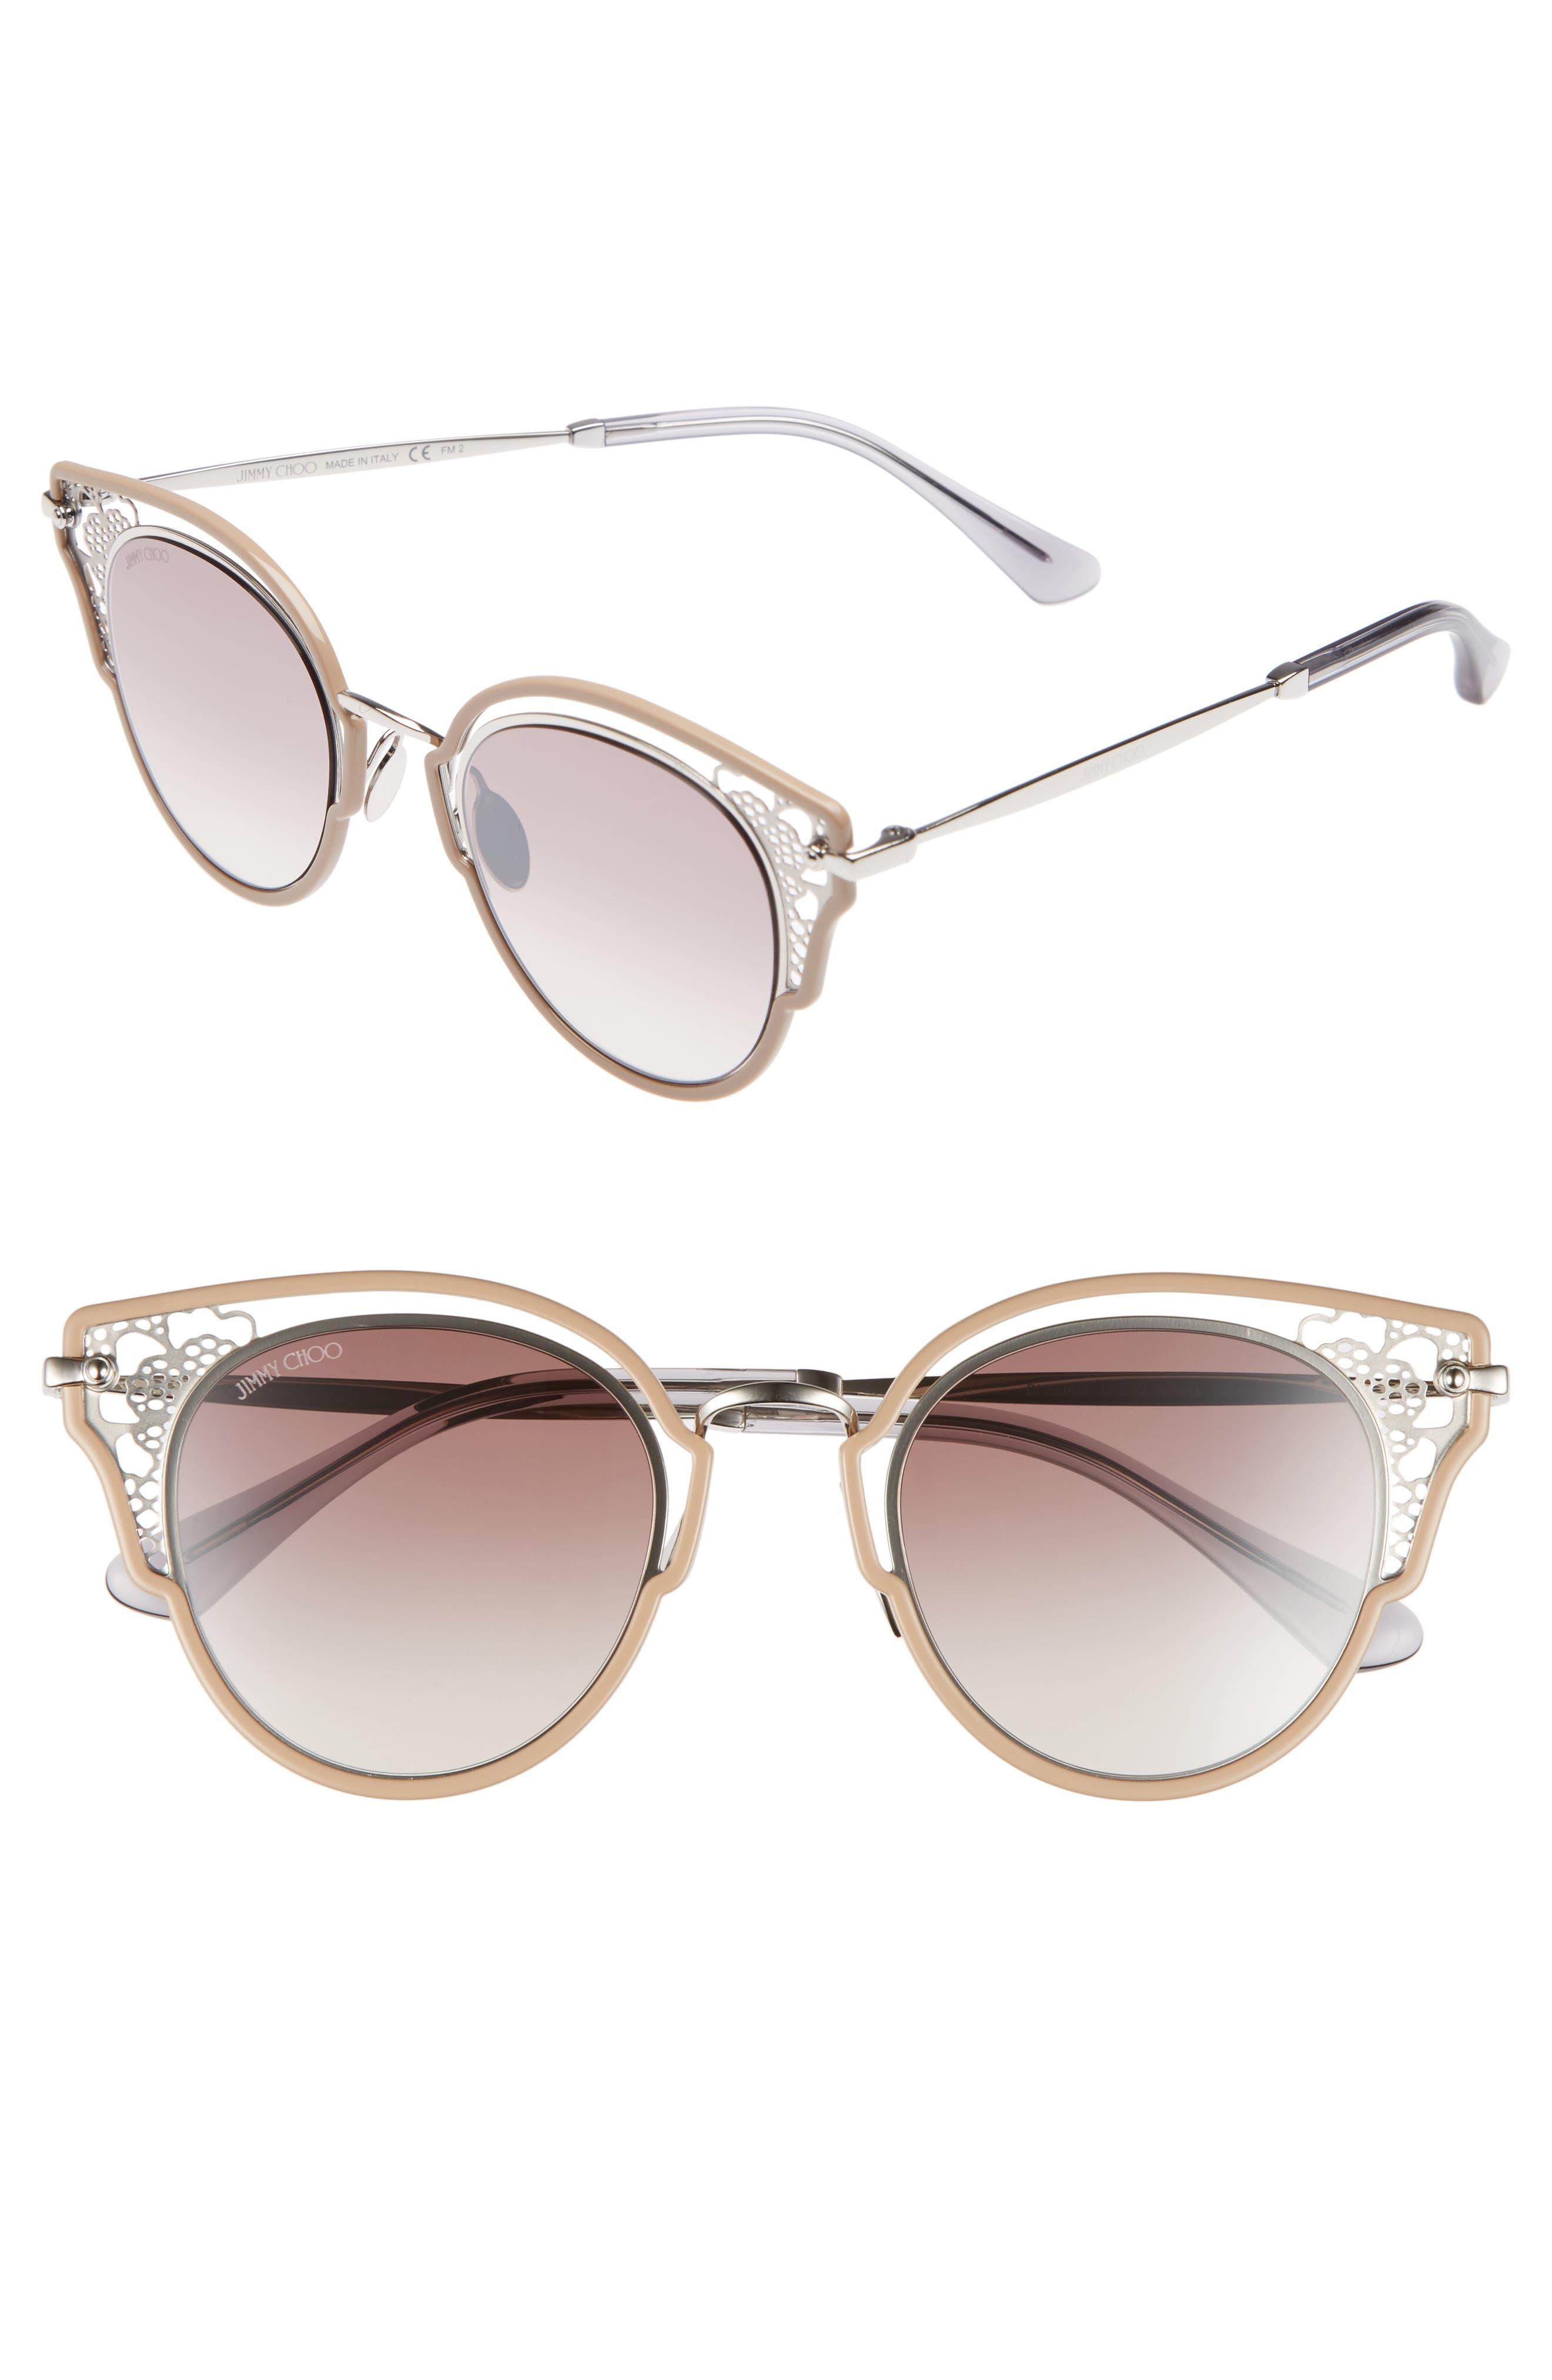 Dhelias 48mm Cat Eye Sunglasses,                             Main thumbnail 1, color,                             Nude Palladium